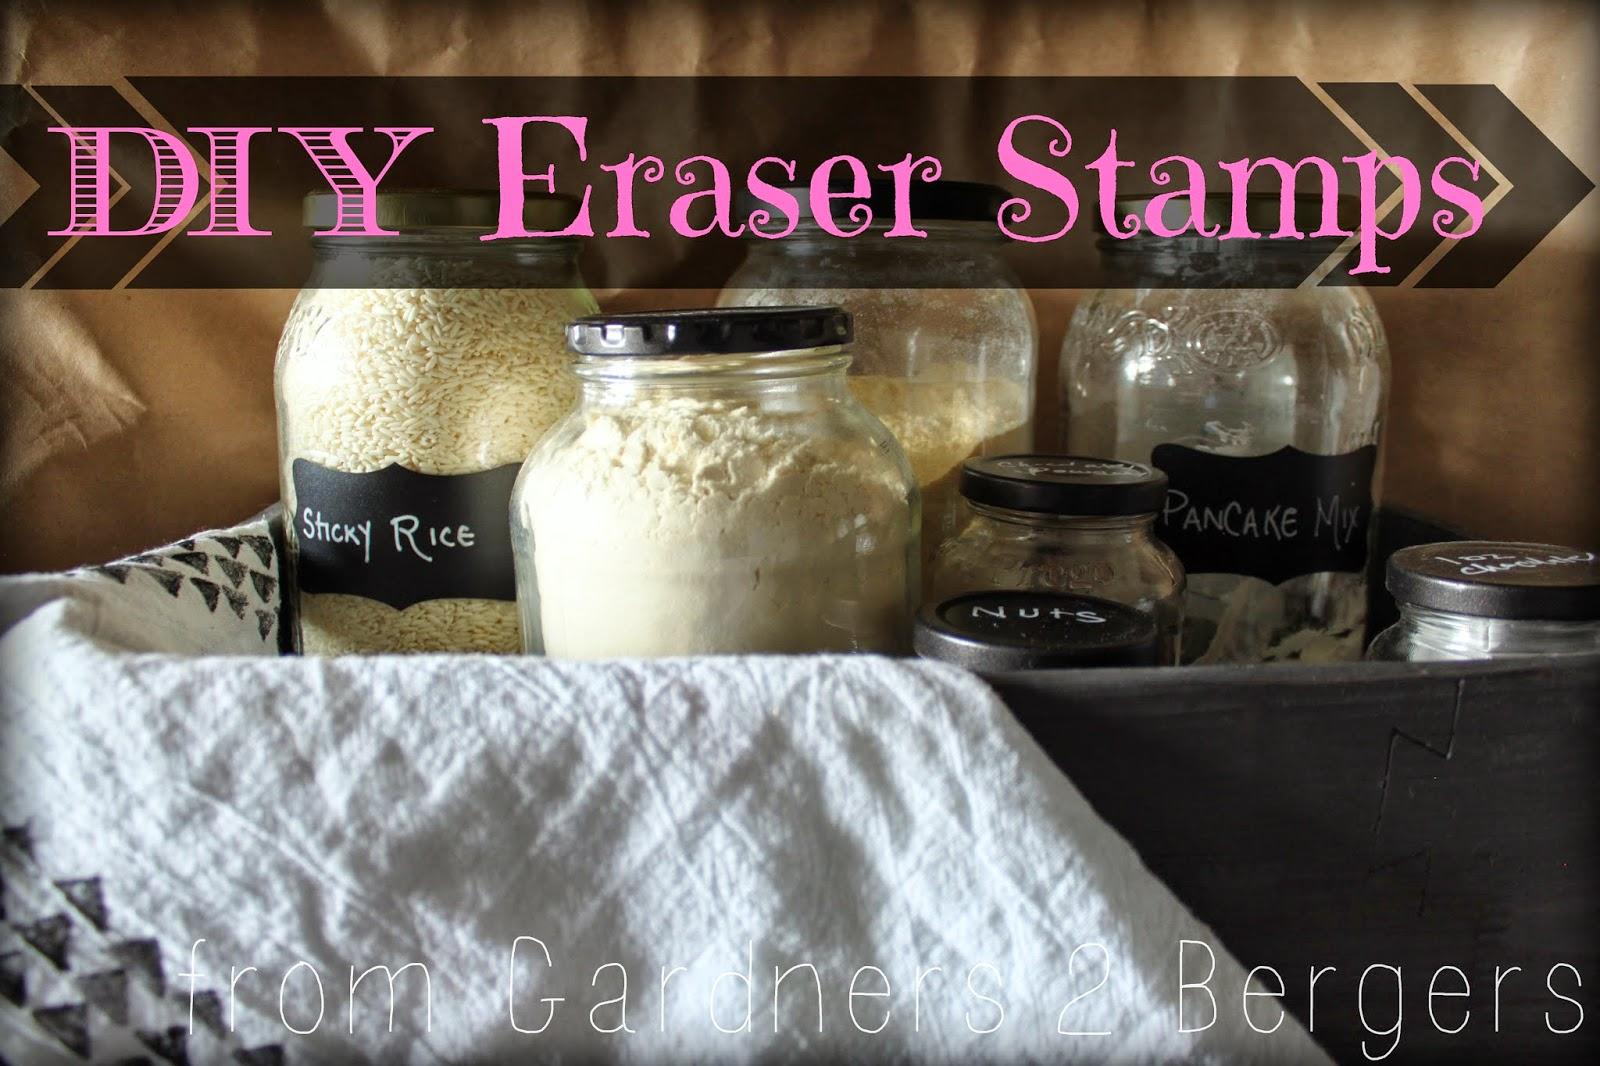 DIY-Number-Two-Eraser-Stamps-for-Fabric-Design